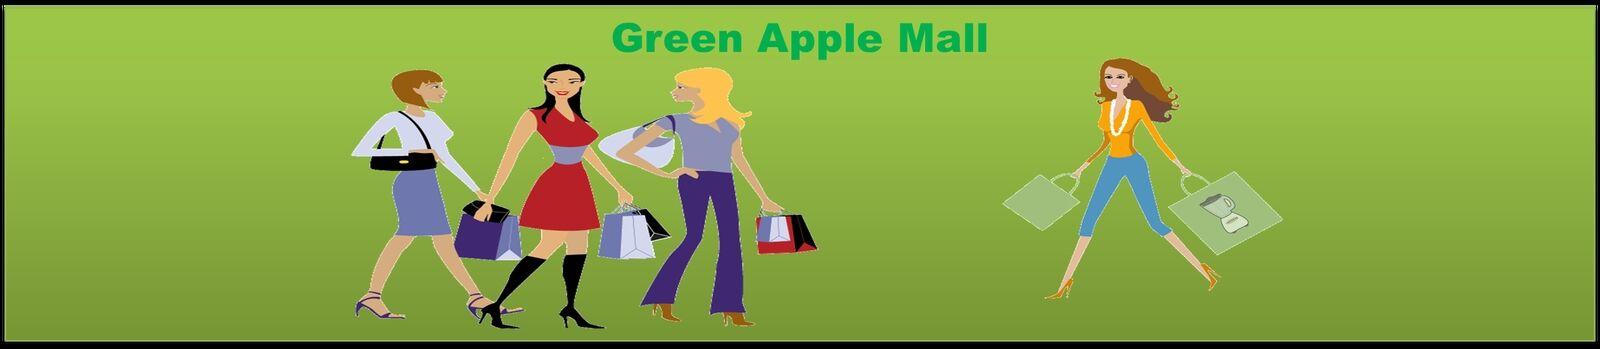 Green Apple Mall